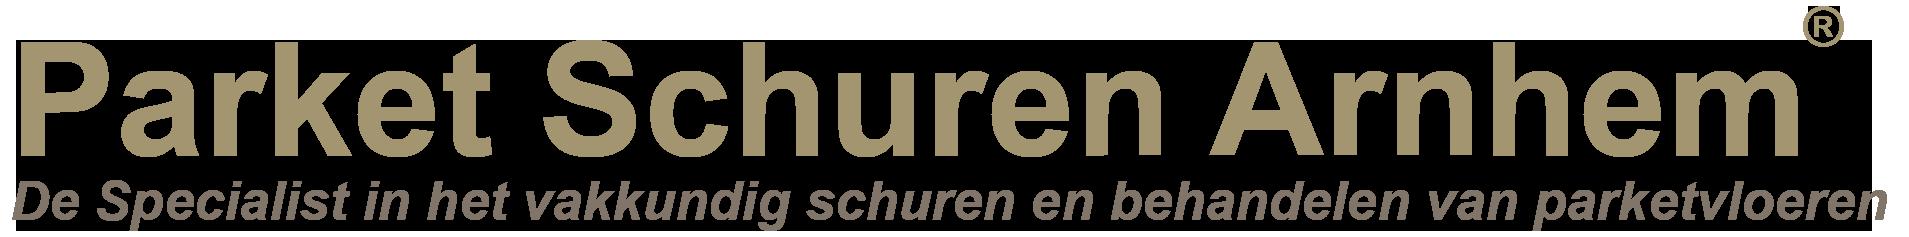 Parket Schuren Arnhem®